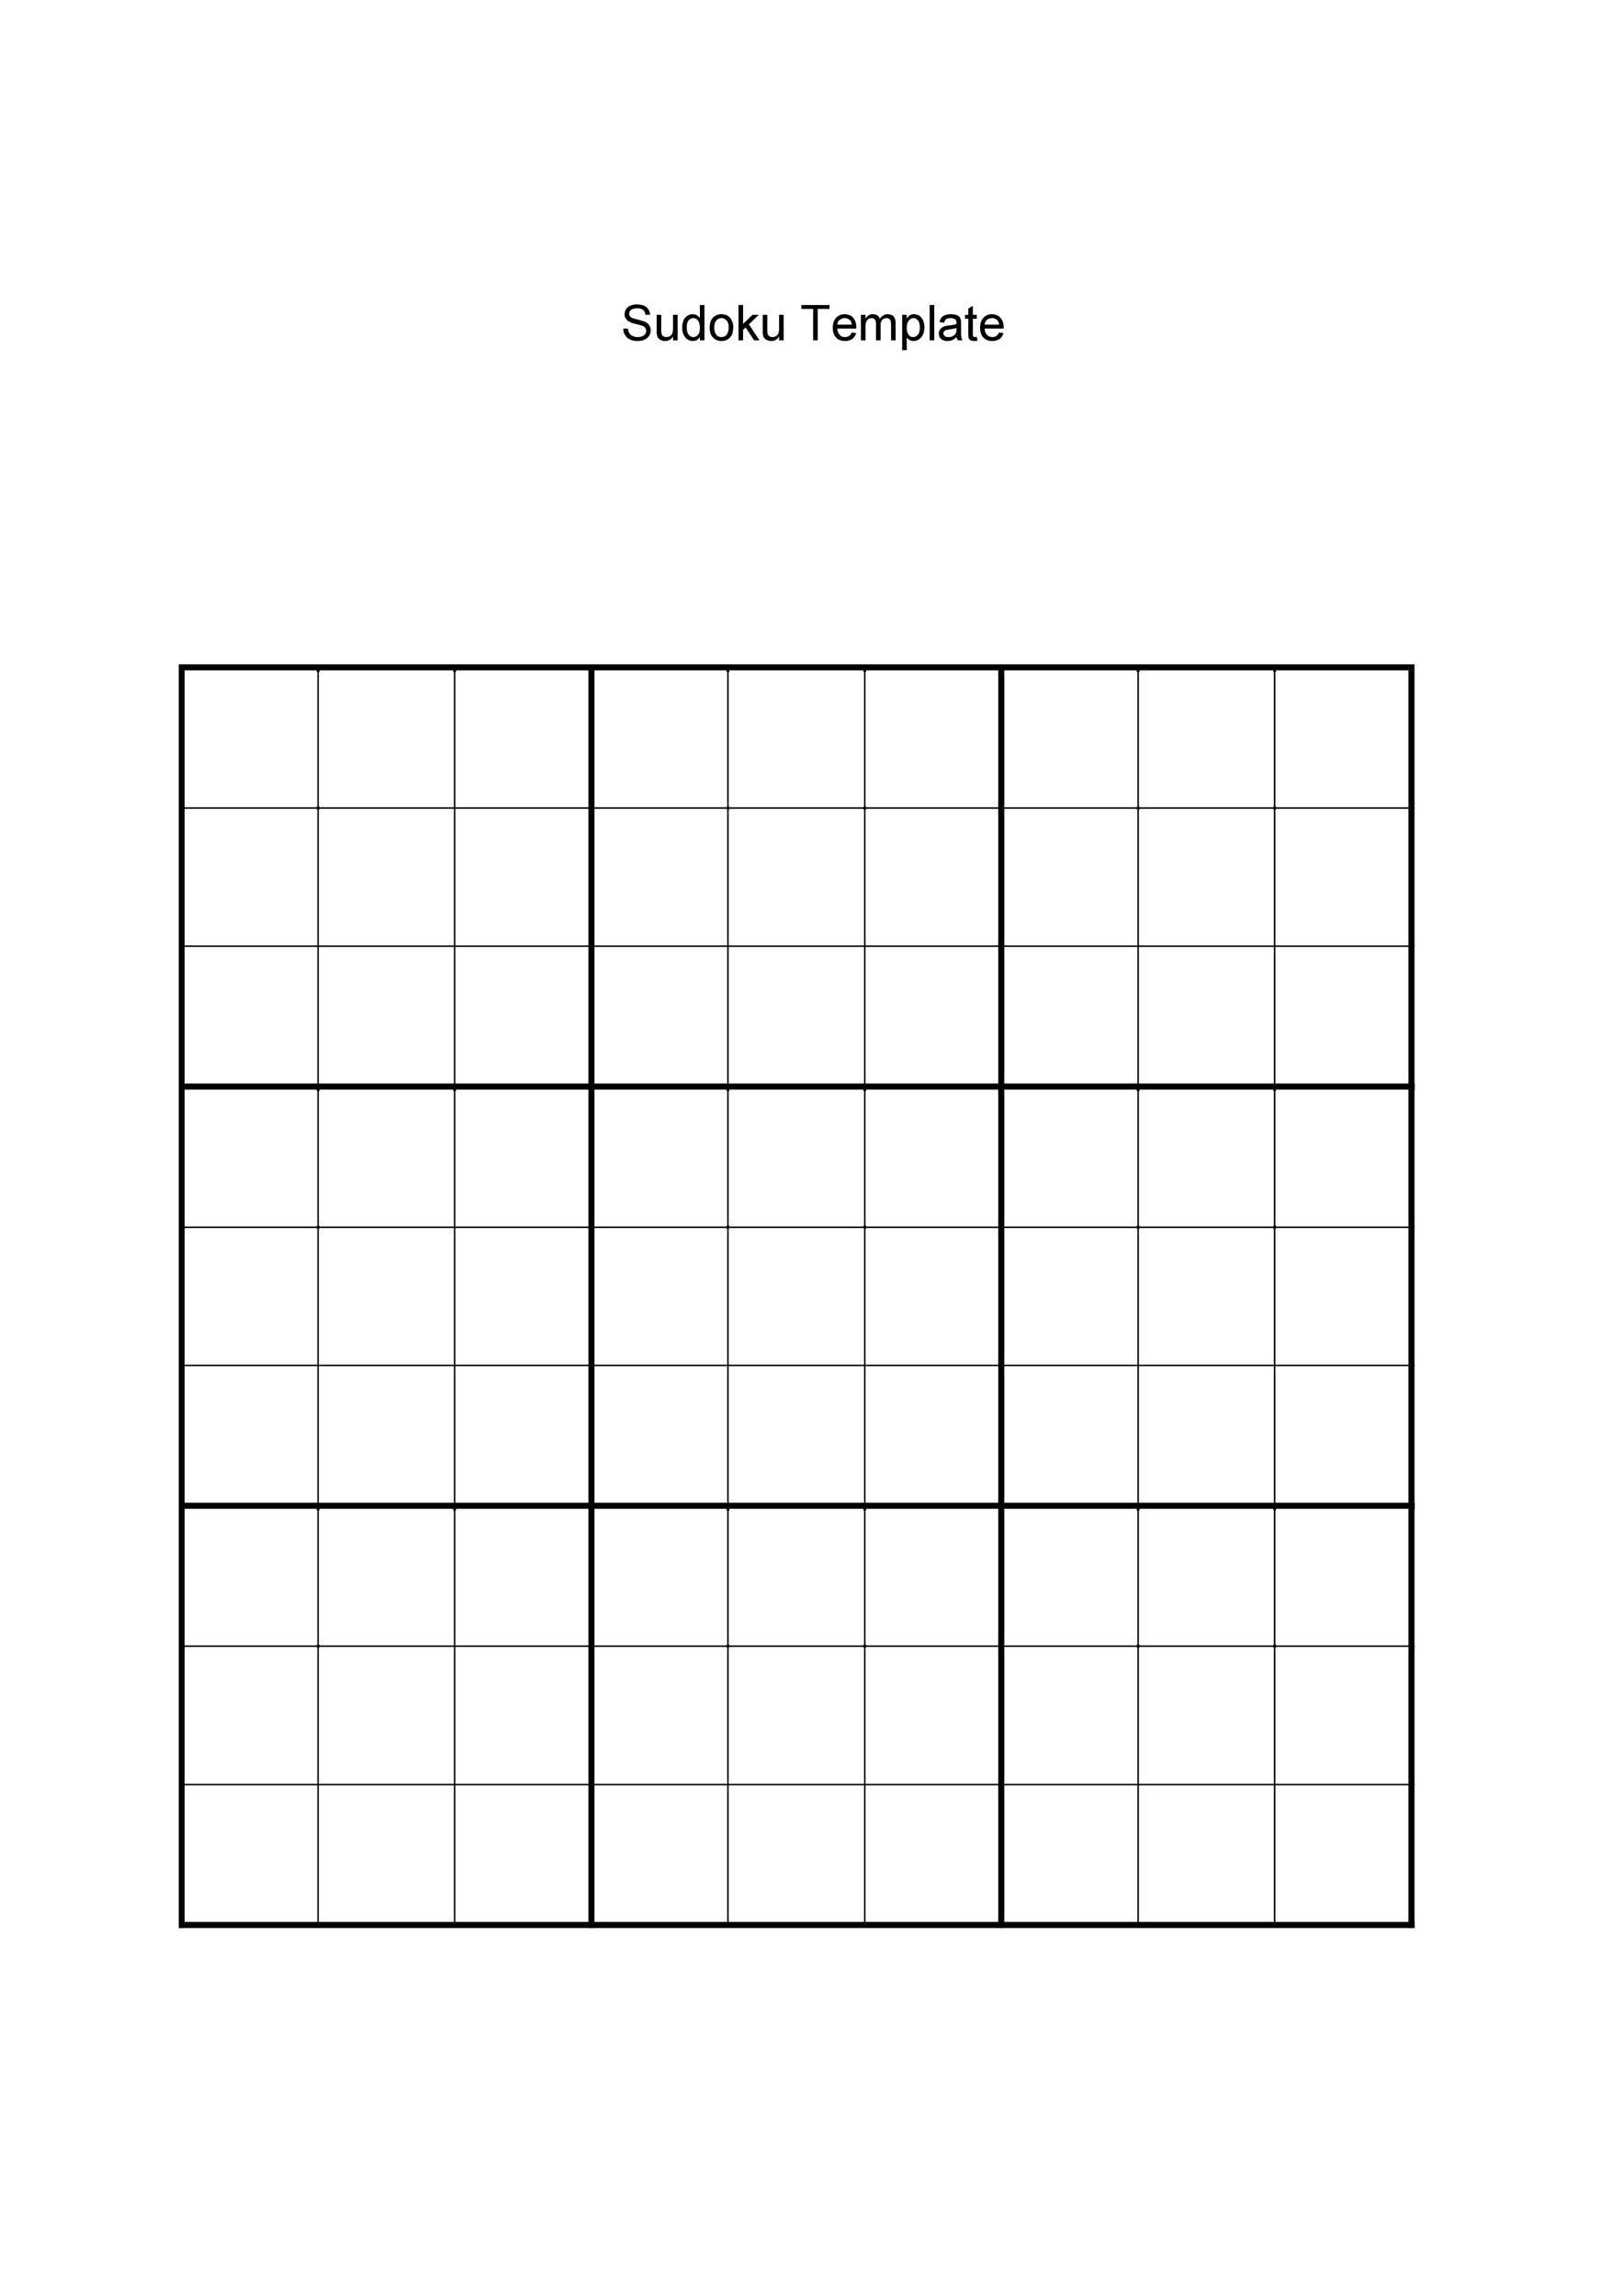 Free blank sudoku grid 10